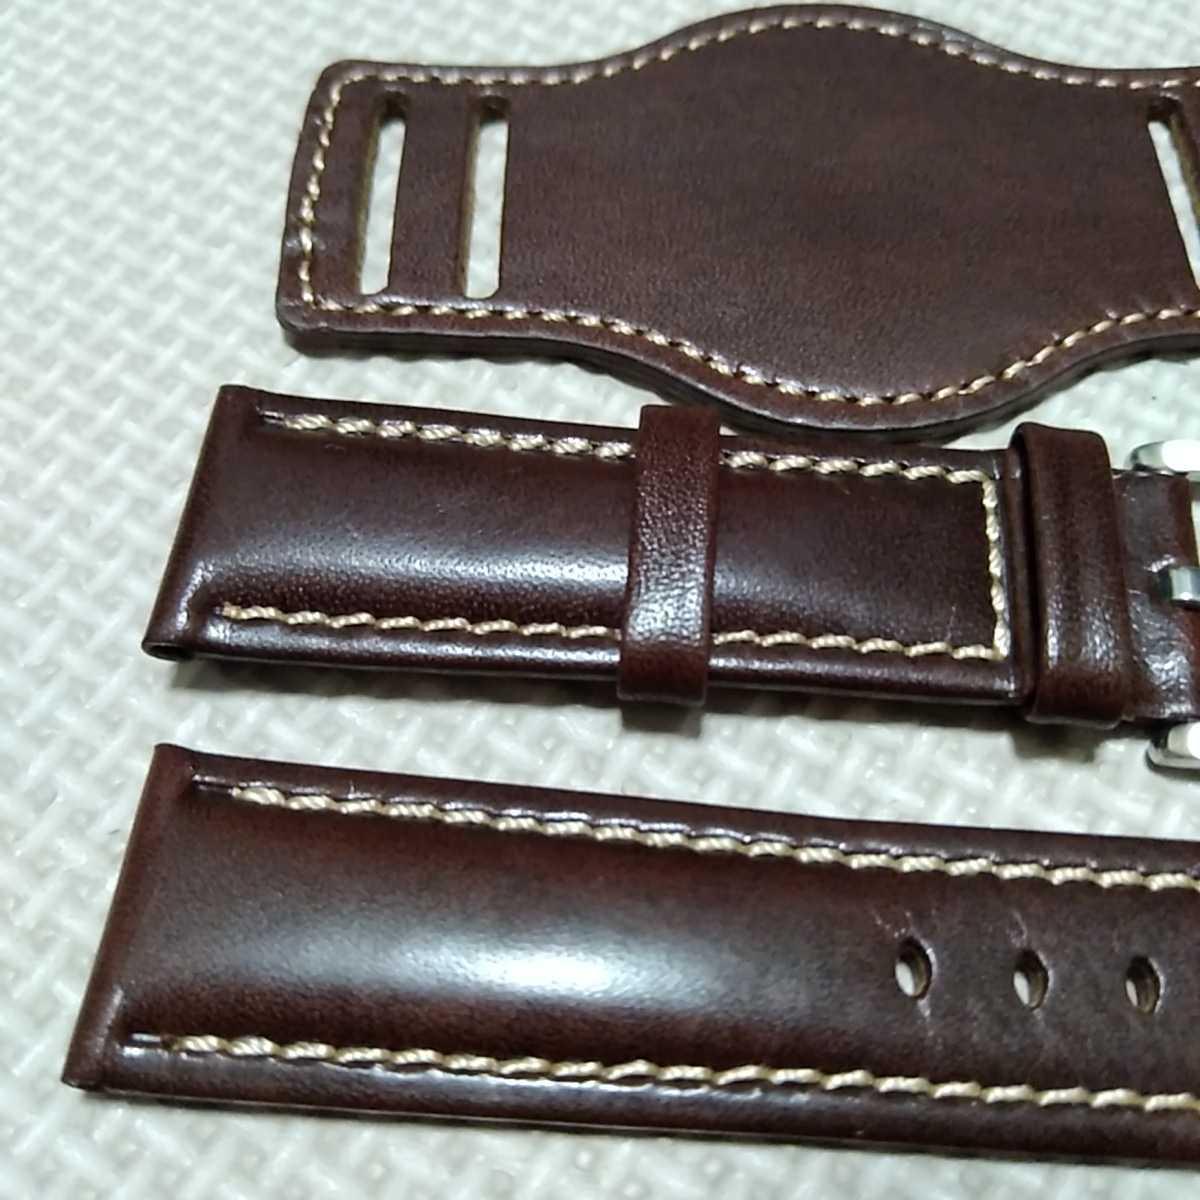 No50 ブンド BUND 本革レザーベルト 腕時計ベルト 交換用ストラップ ブラウン 22mm 未使用 高品質 ドイツパイロット 空軍_画像2